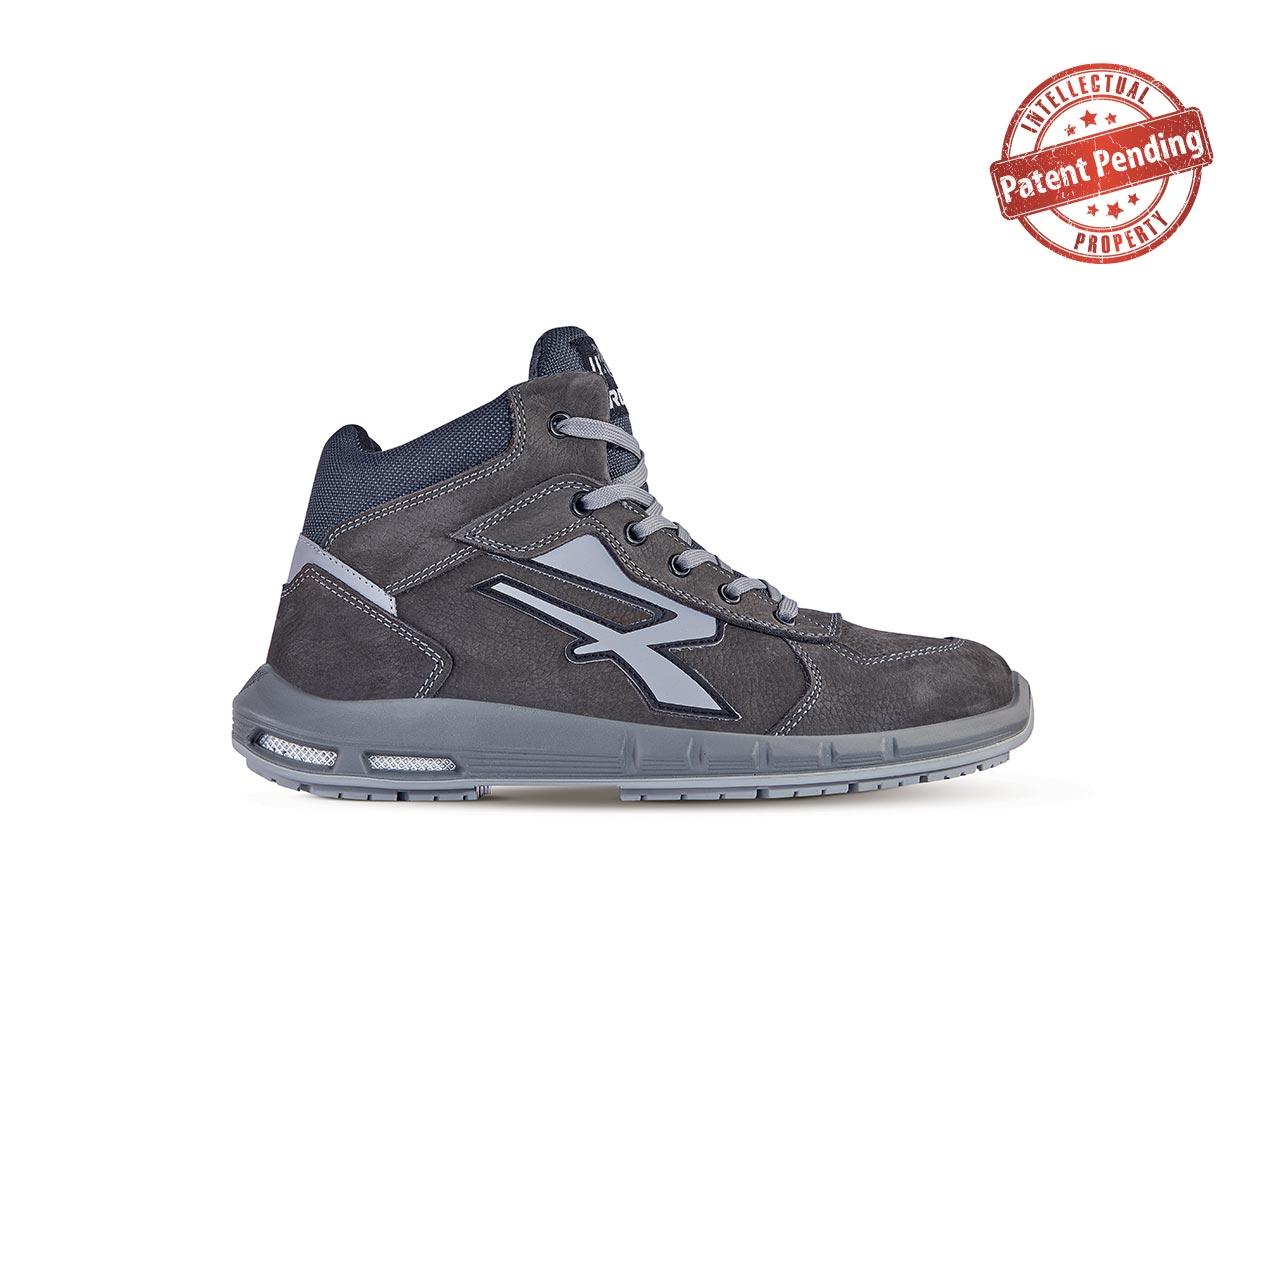 scarpa antinfortunistica upower modello merak plus linea redup plus vista laterale